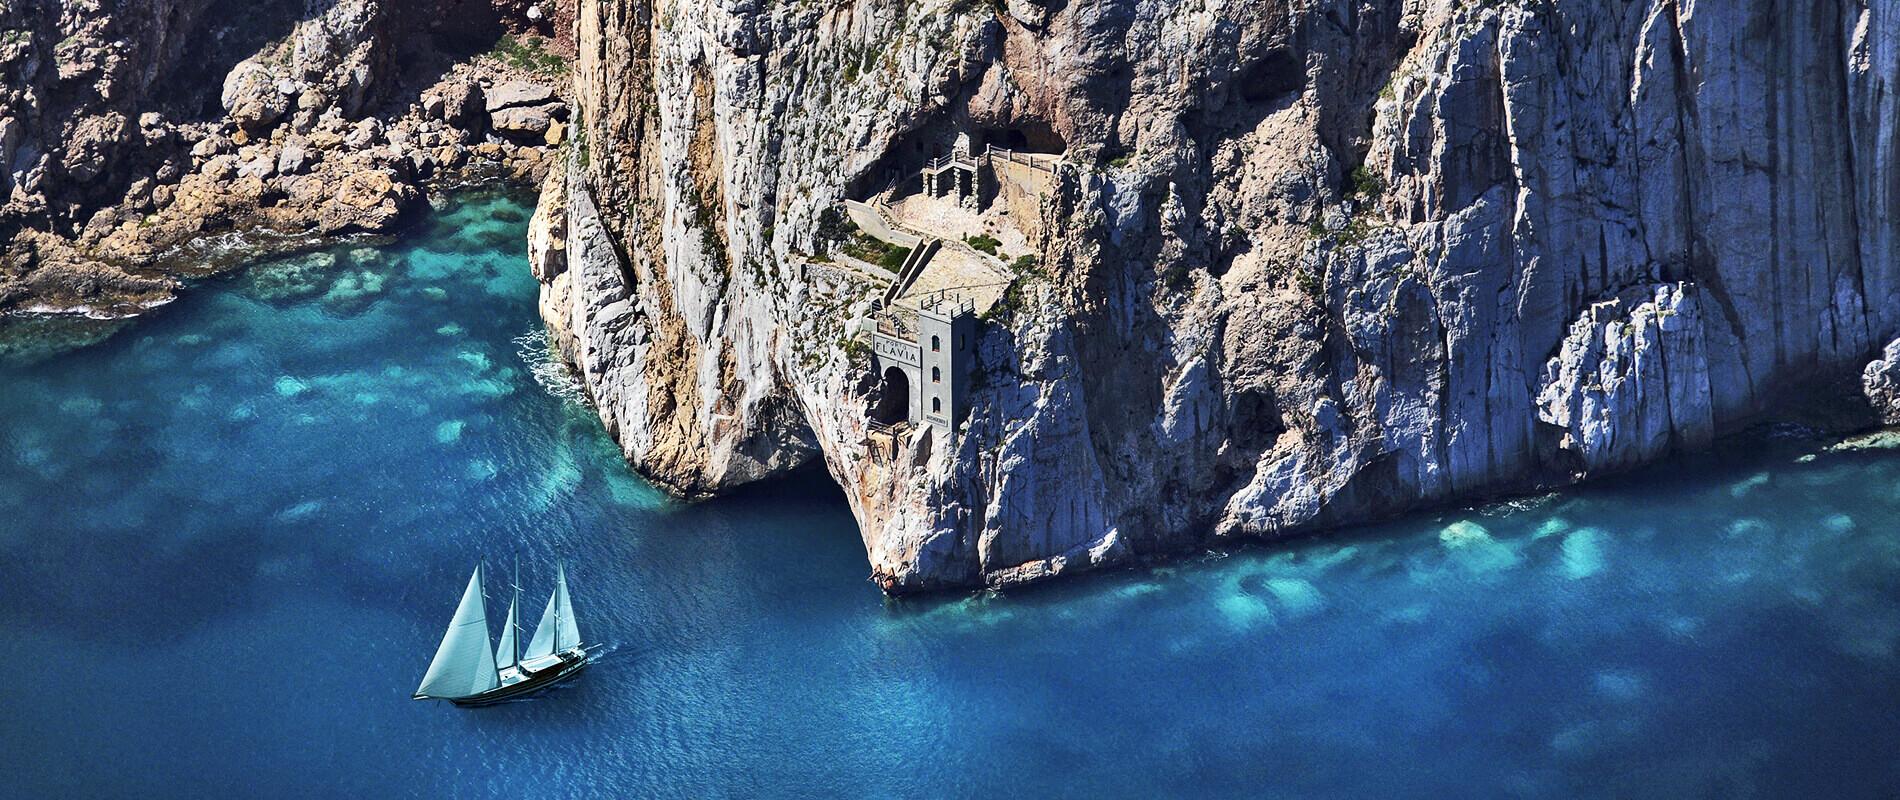 Porto Flavia, un'opera ingegnosa dal panorama mozzafiato